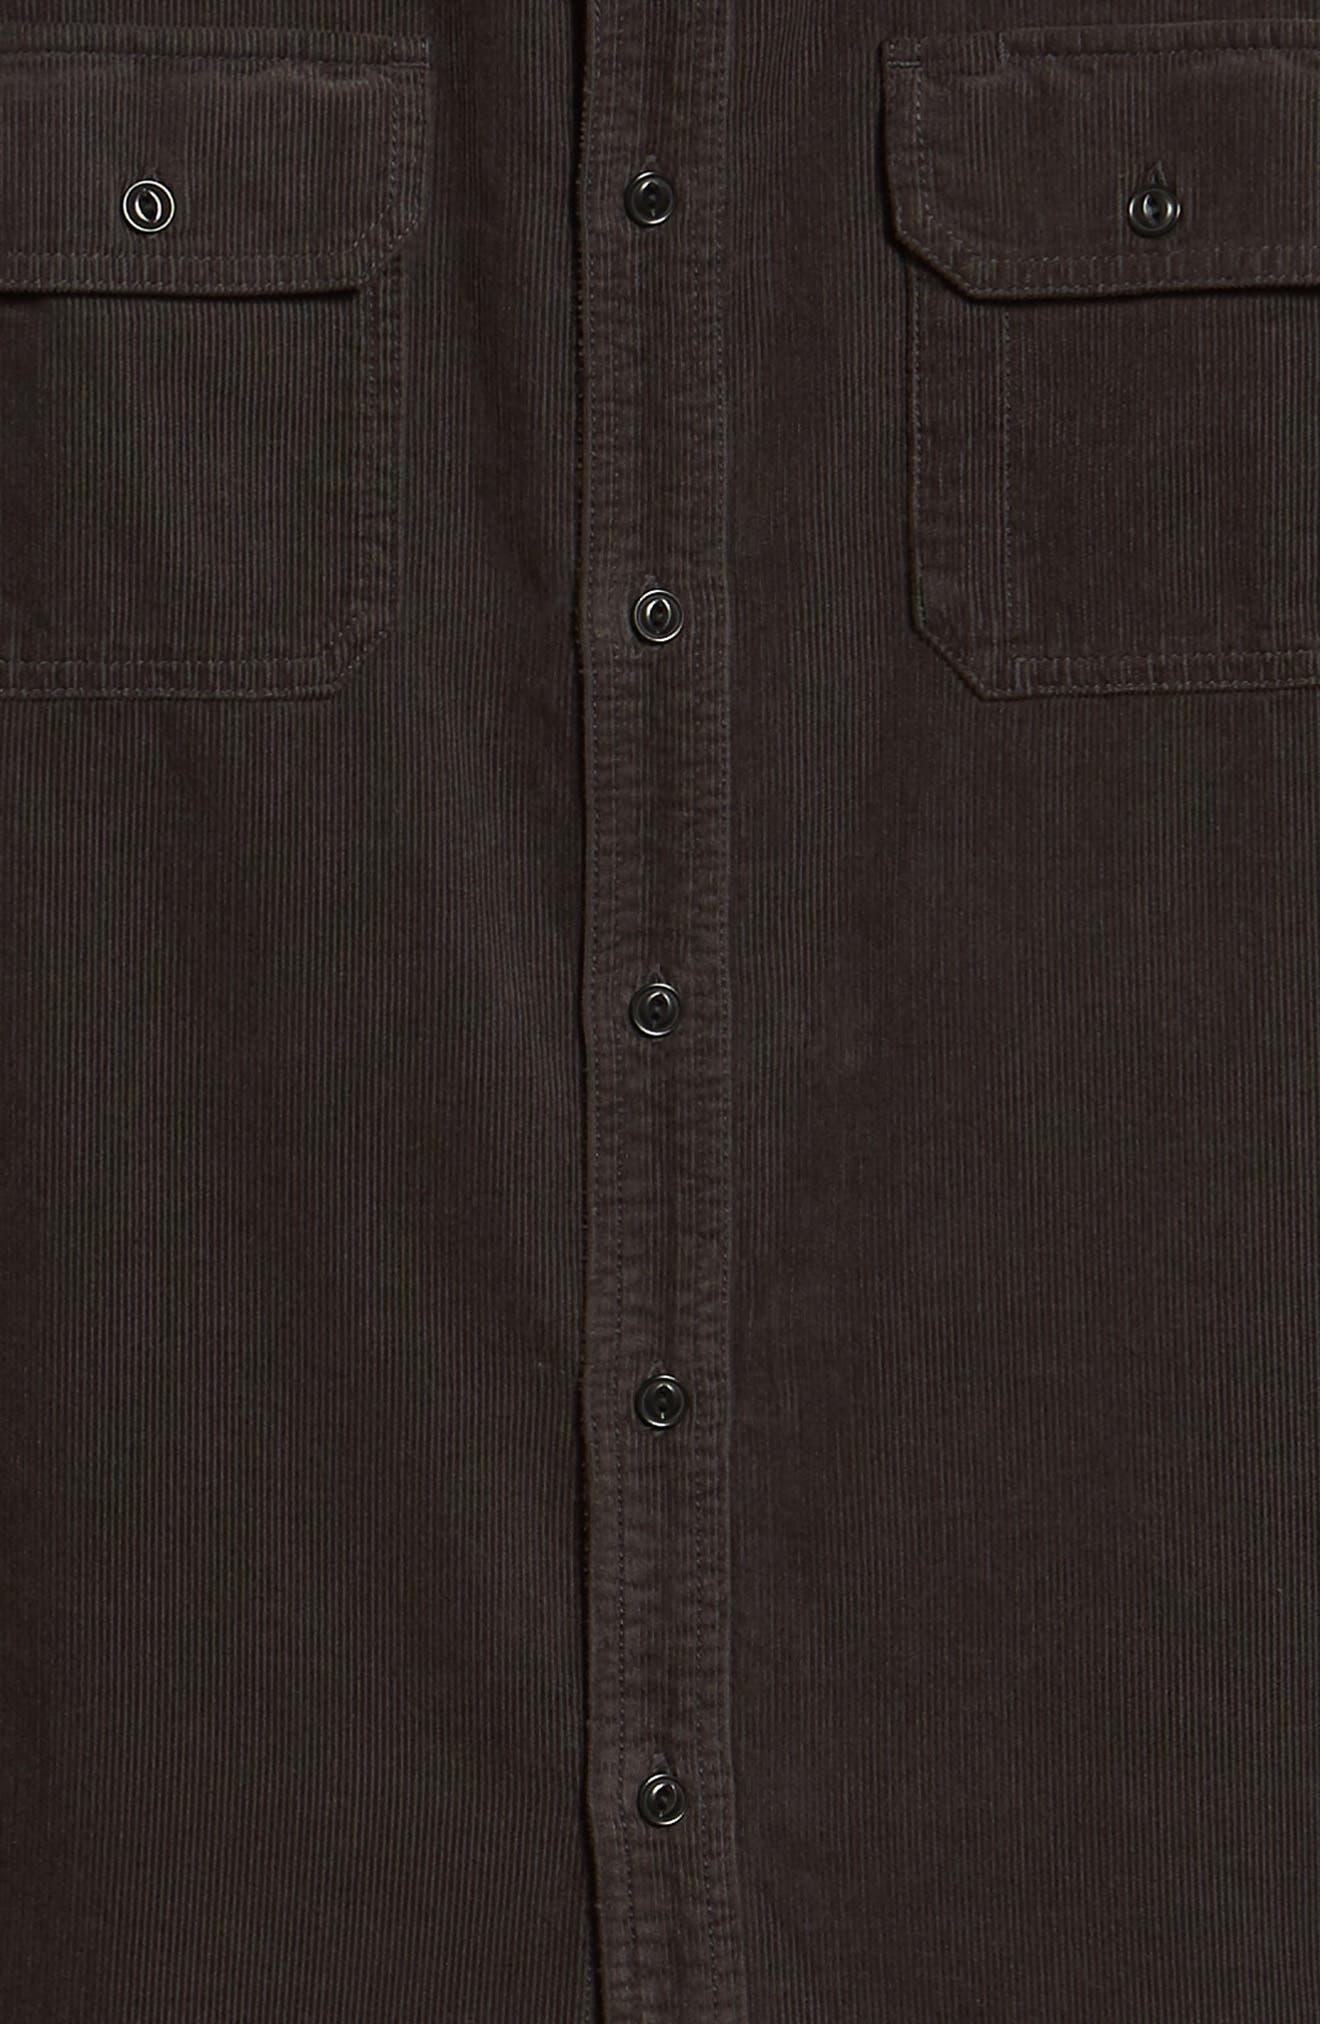 Benning Slim Fit Utility Shirt,                             Alternate thumbnail 6, color,                             GRAY STONE